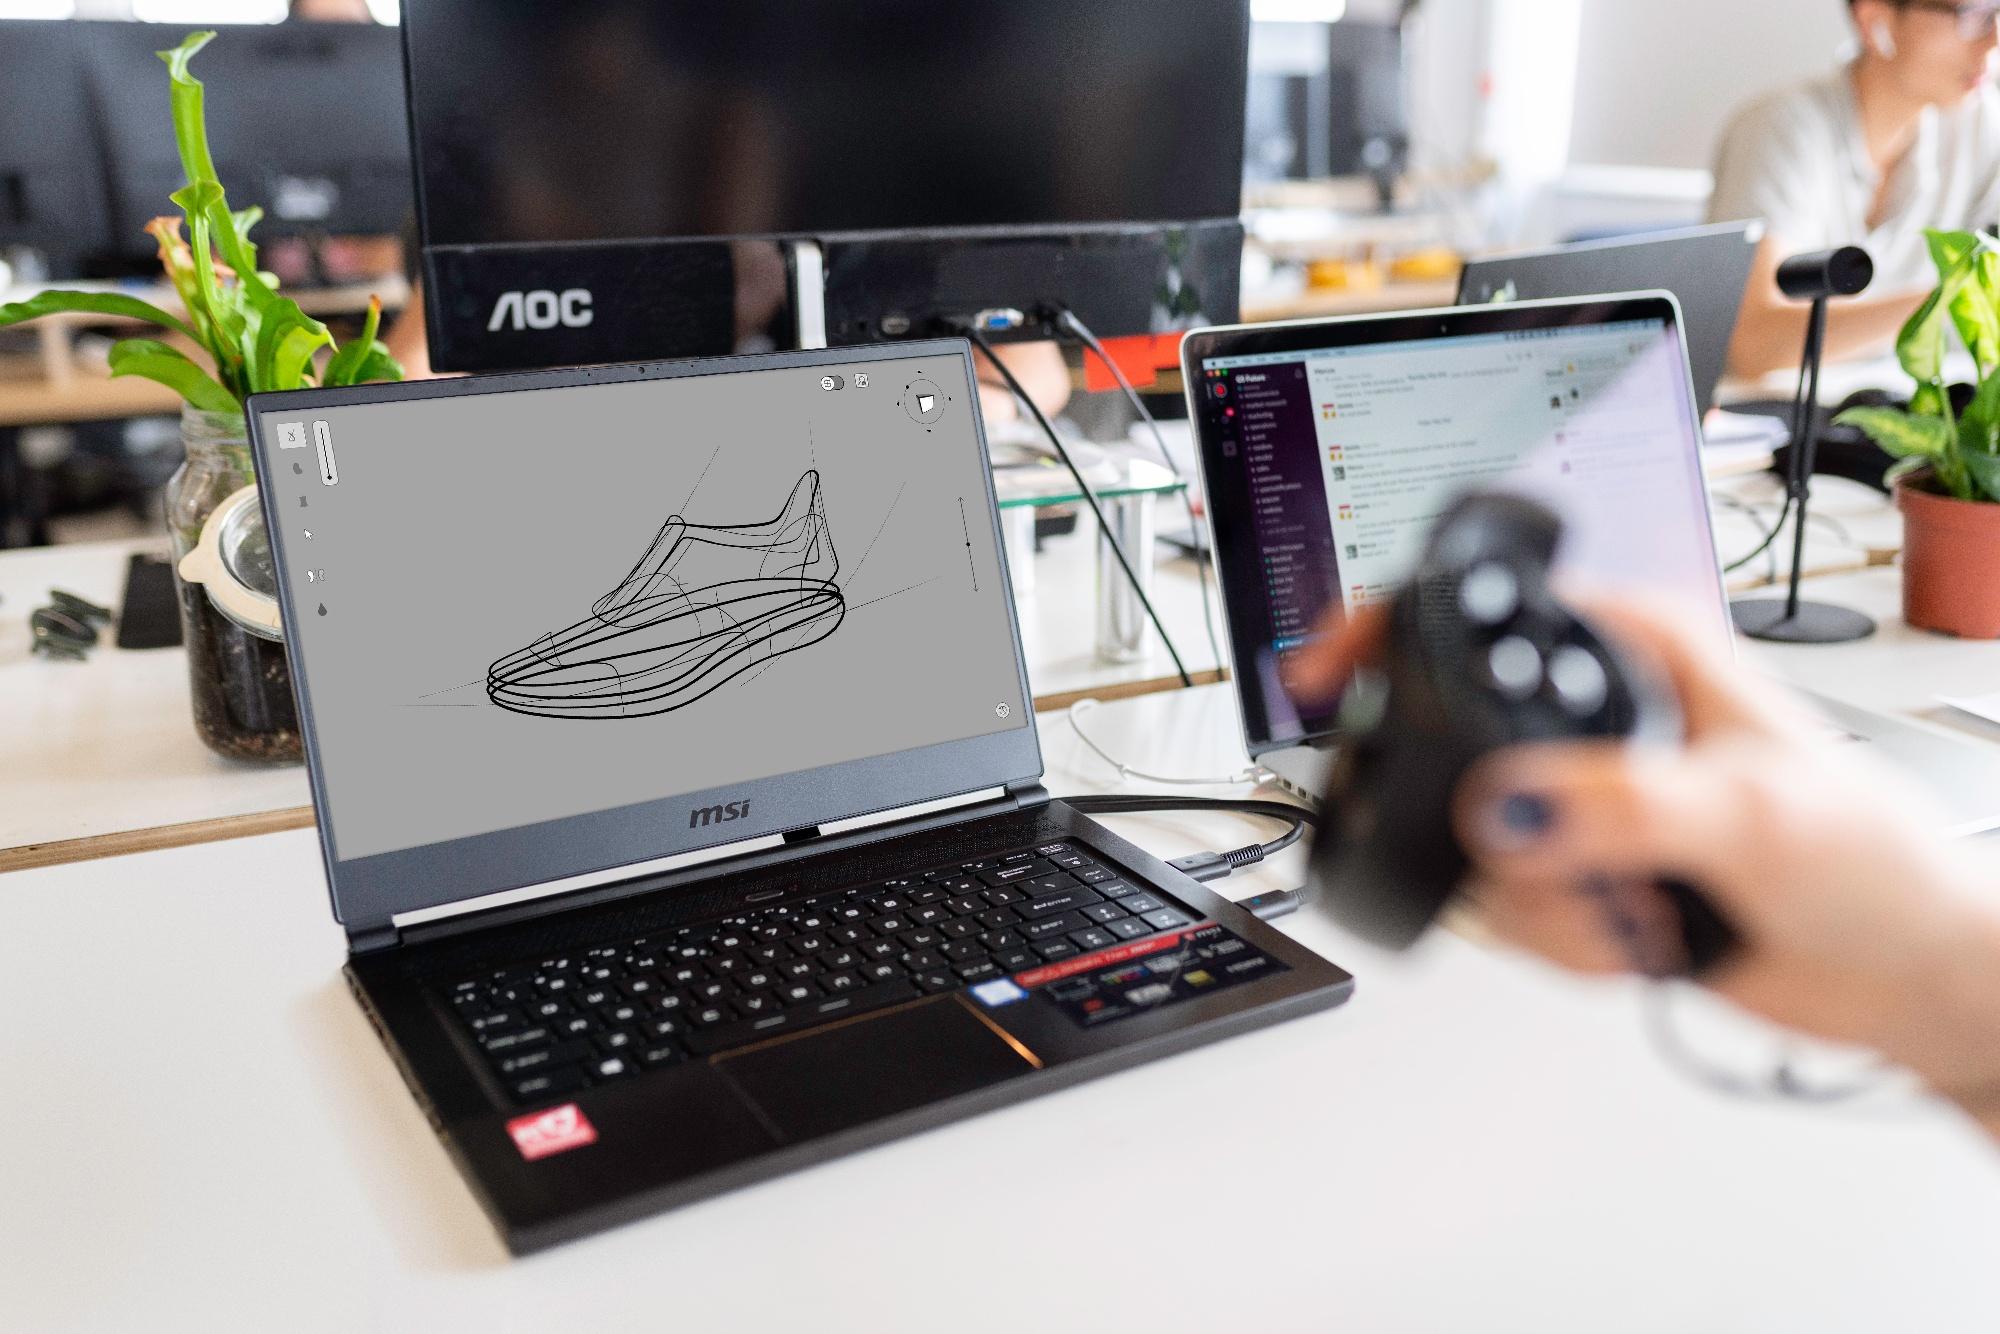 Shoe design in 3D